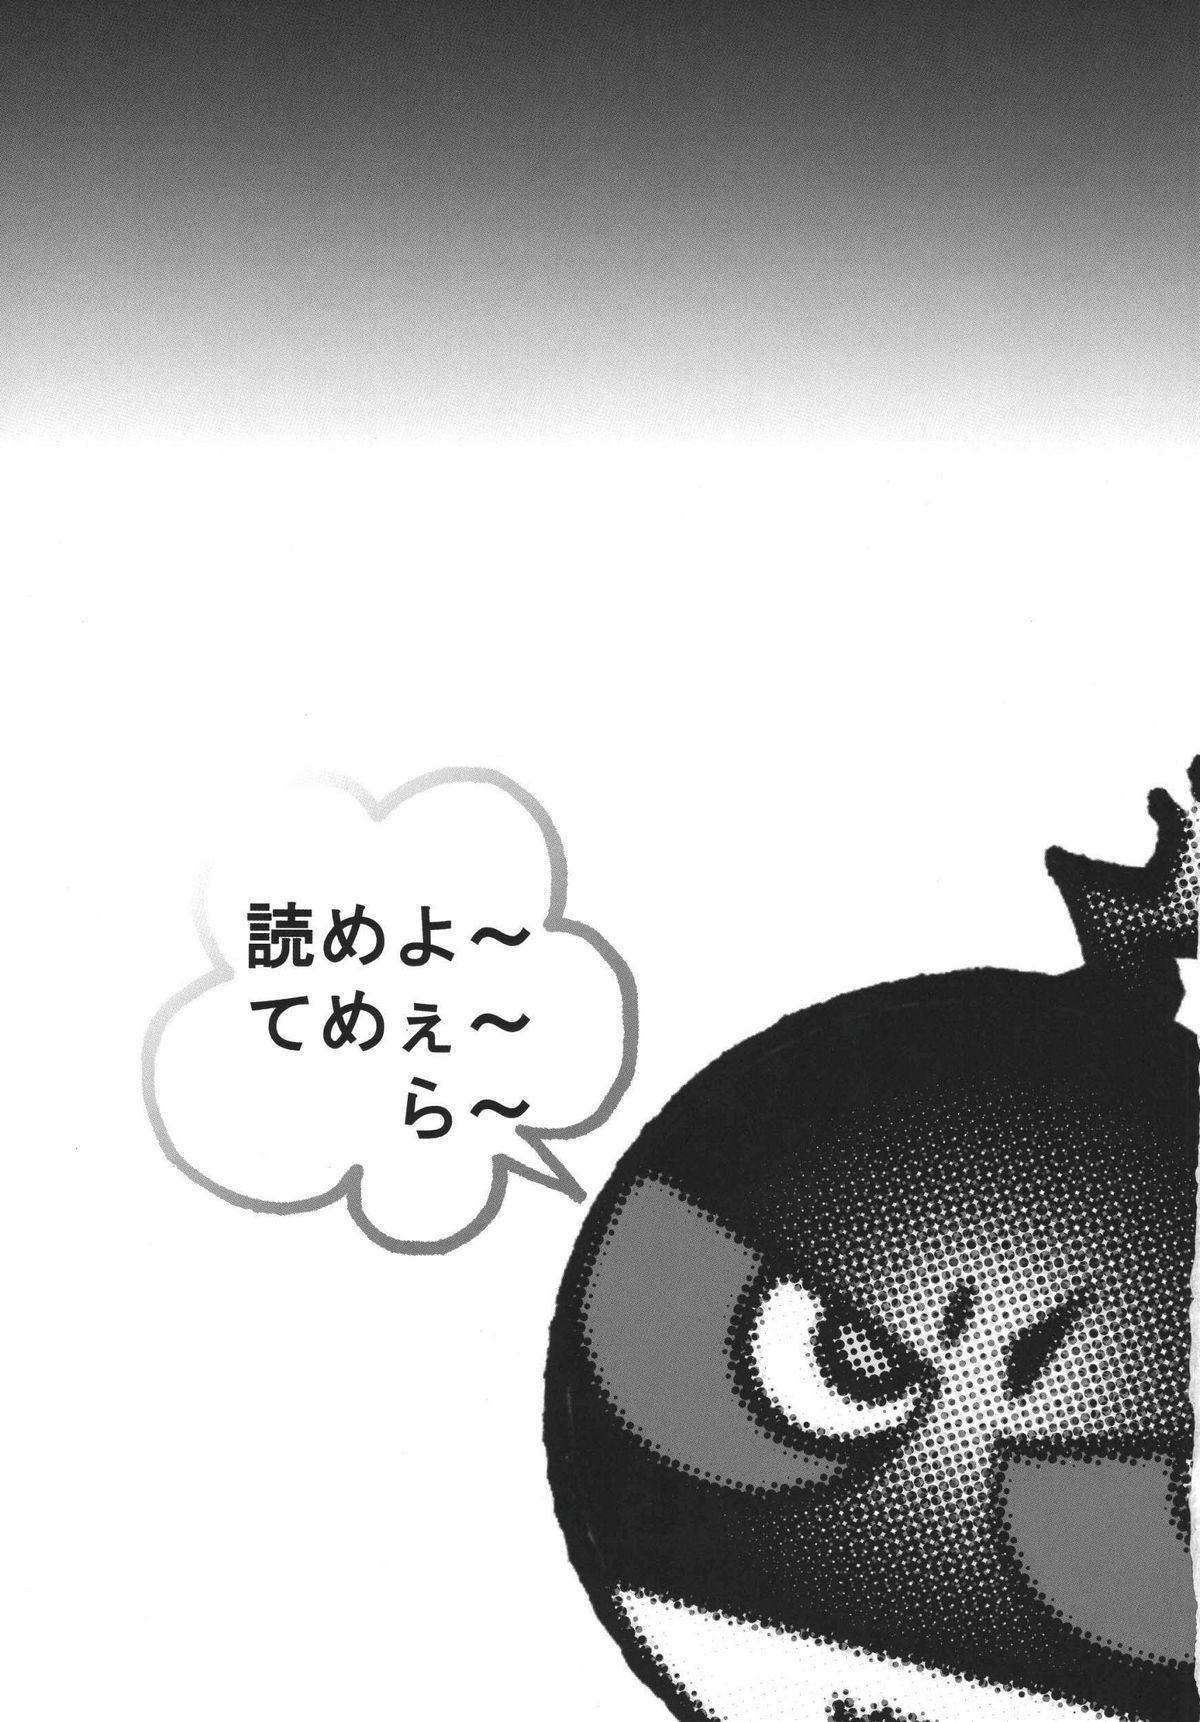 Kanimiso Vol. 4 - Love Dynamites 1